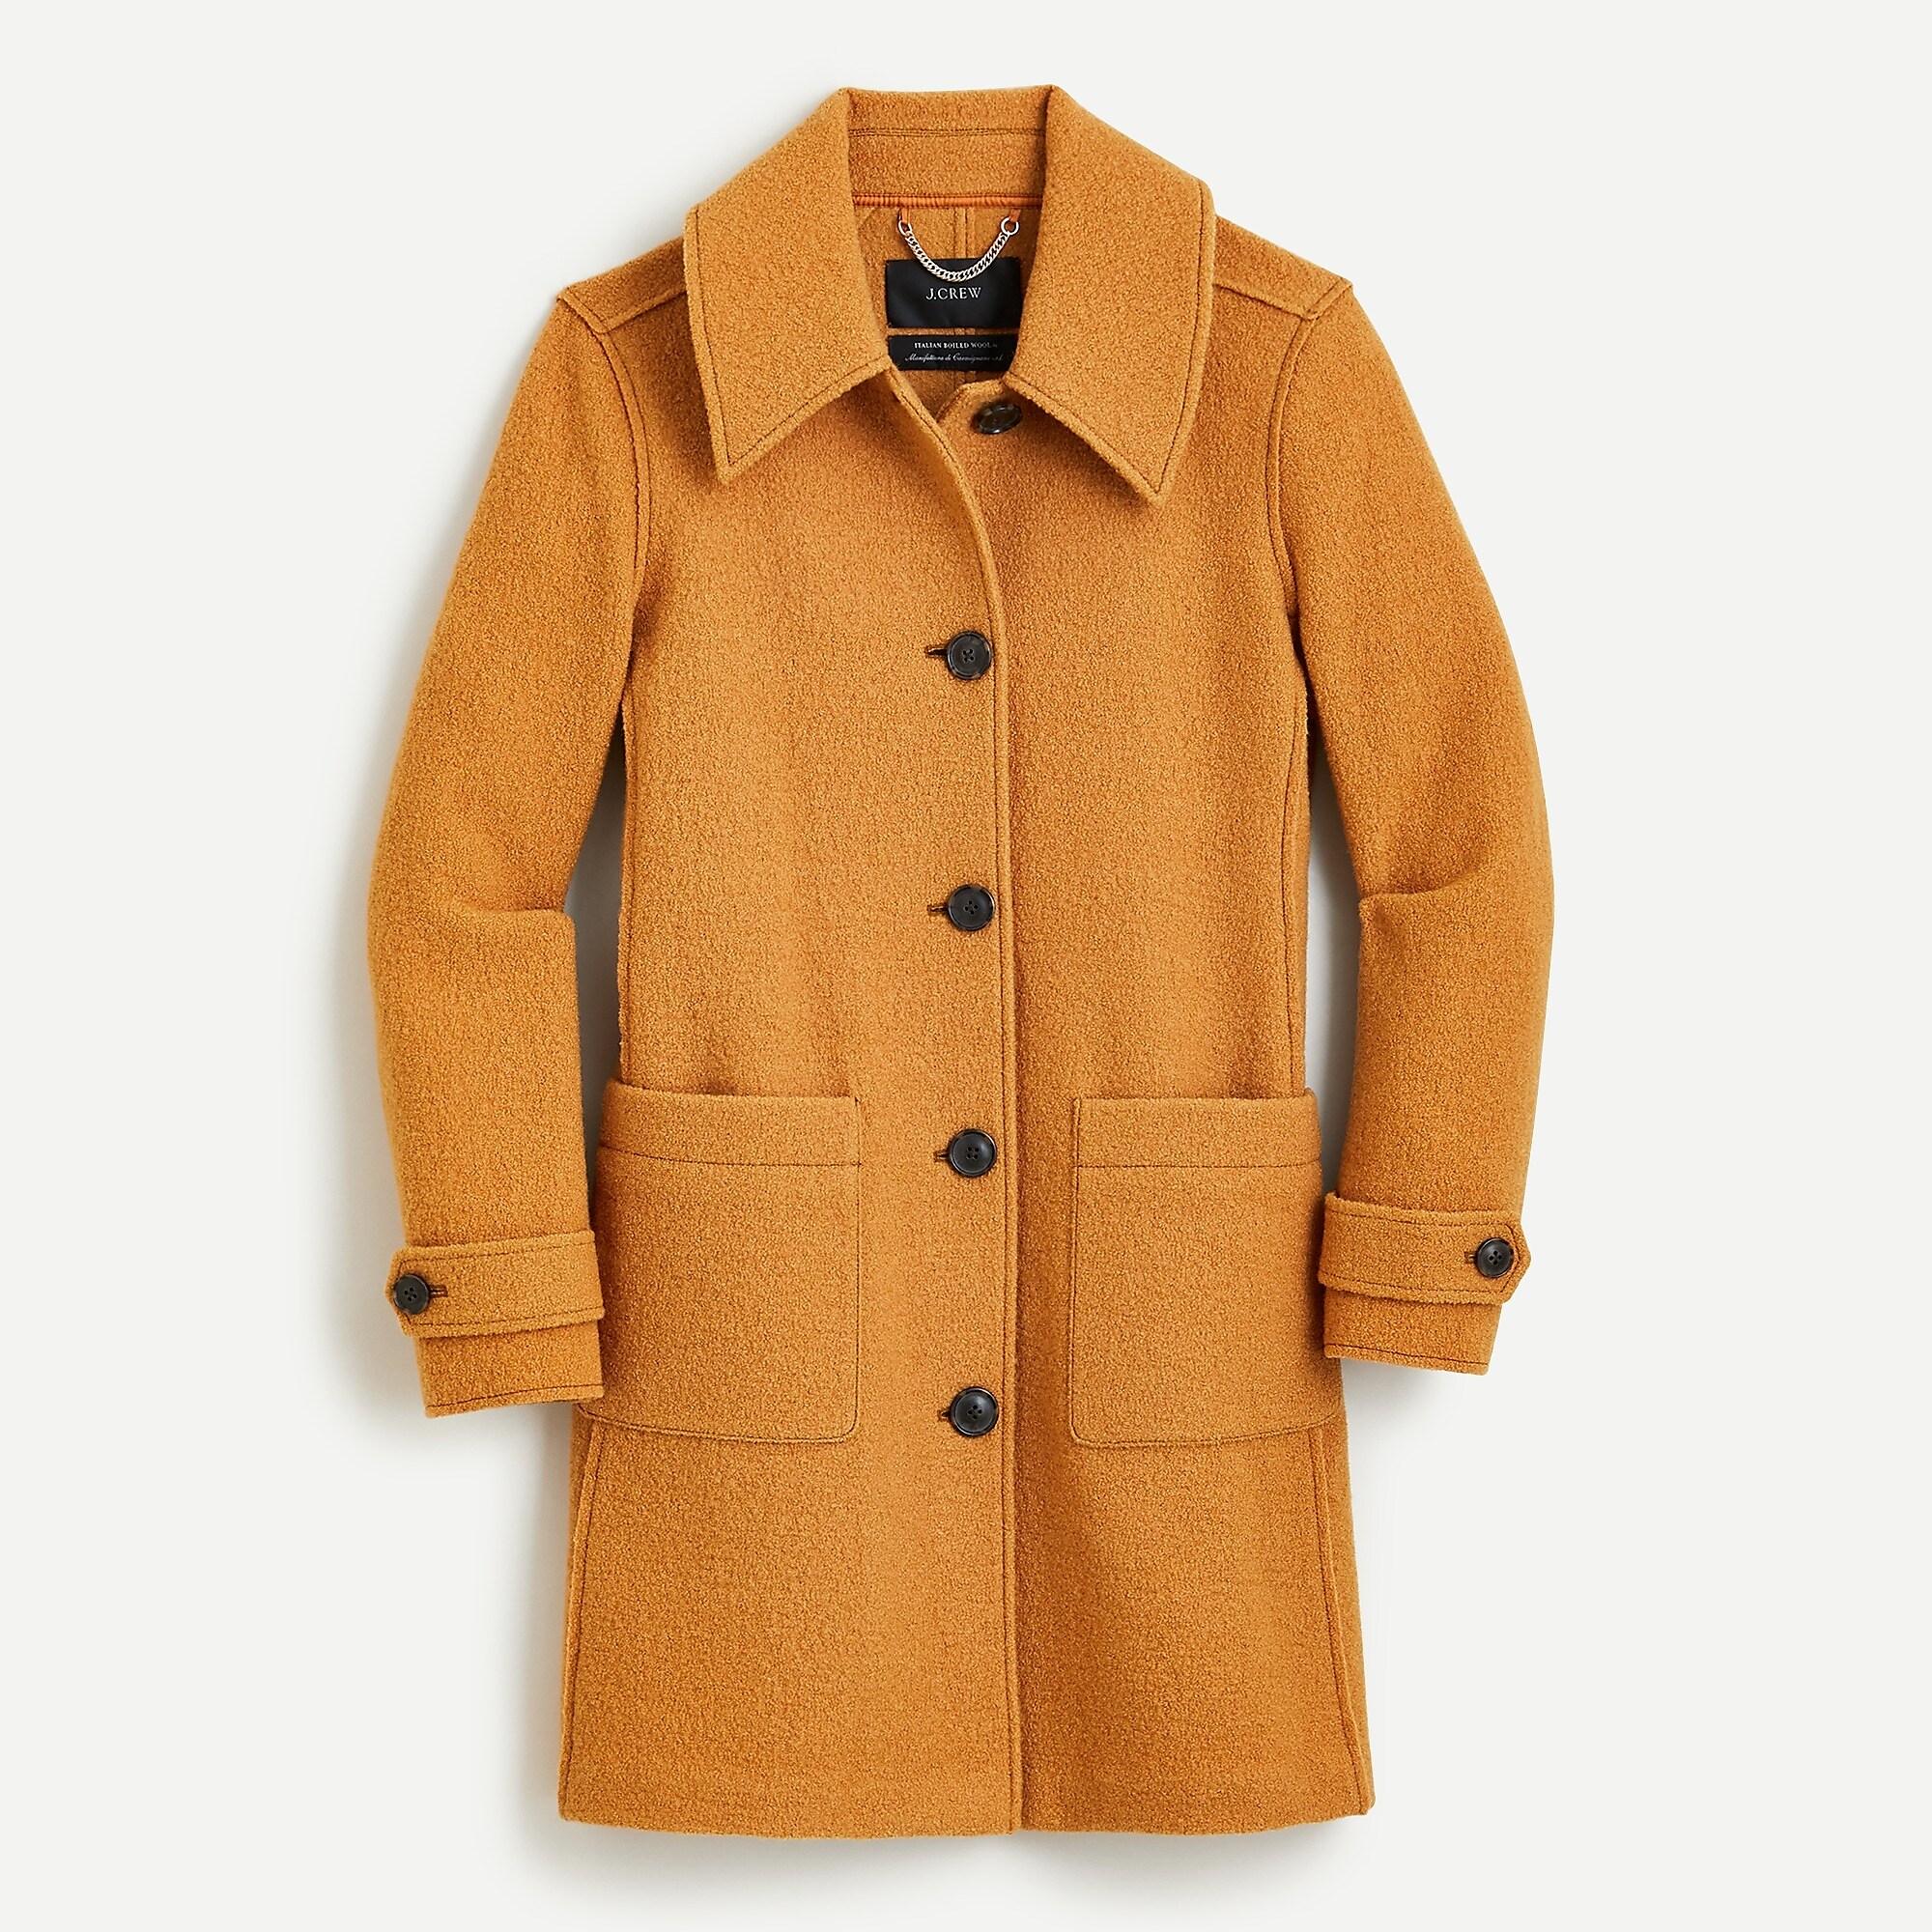 Lady coat in Italian boiled wool | J.Crew US